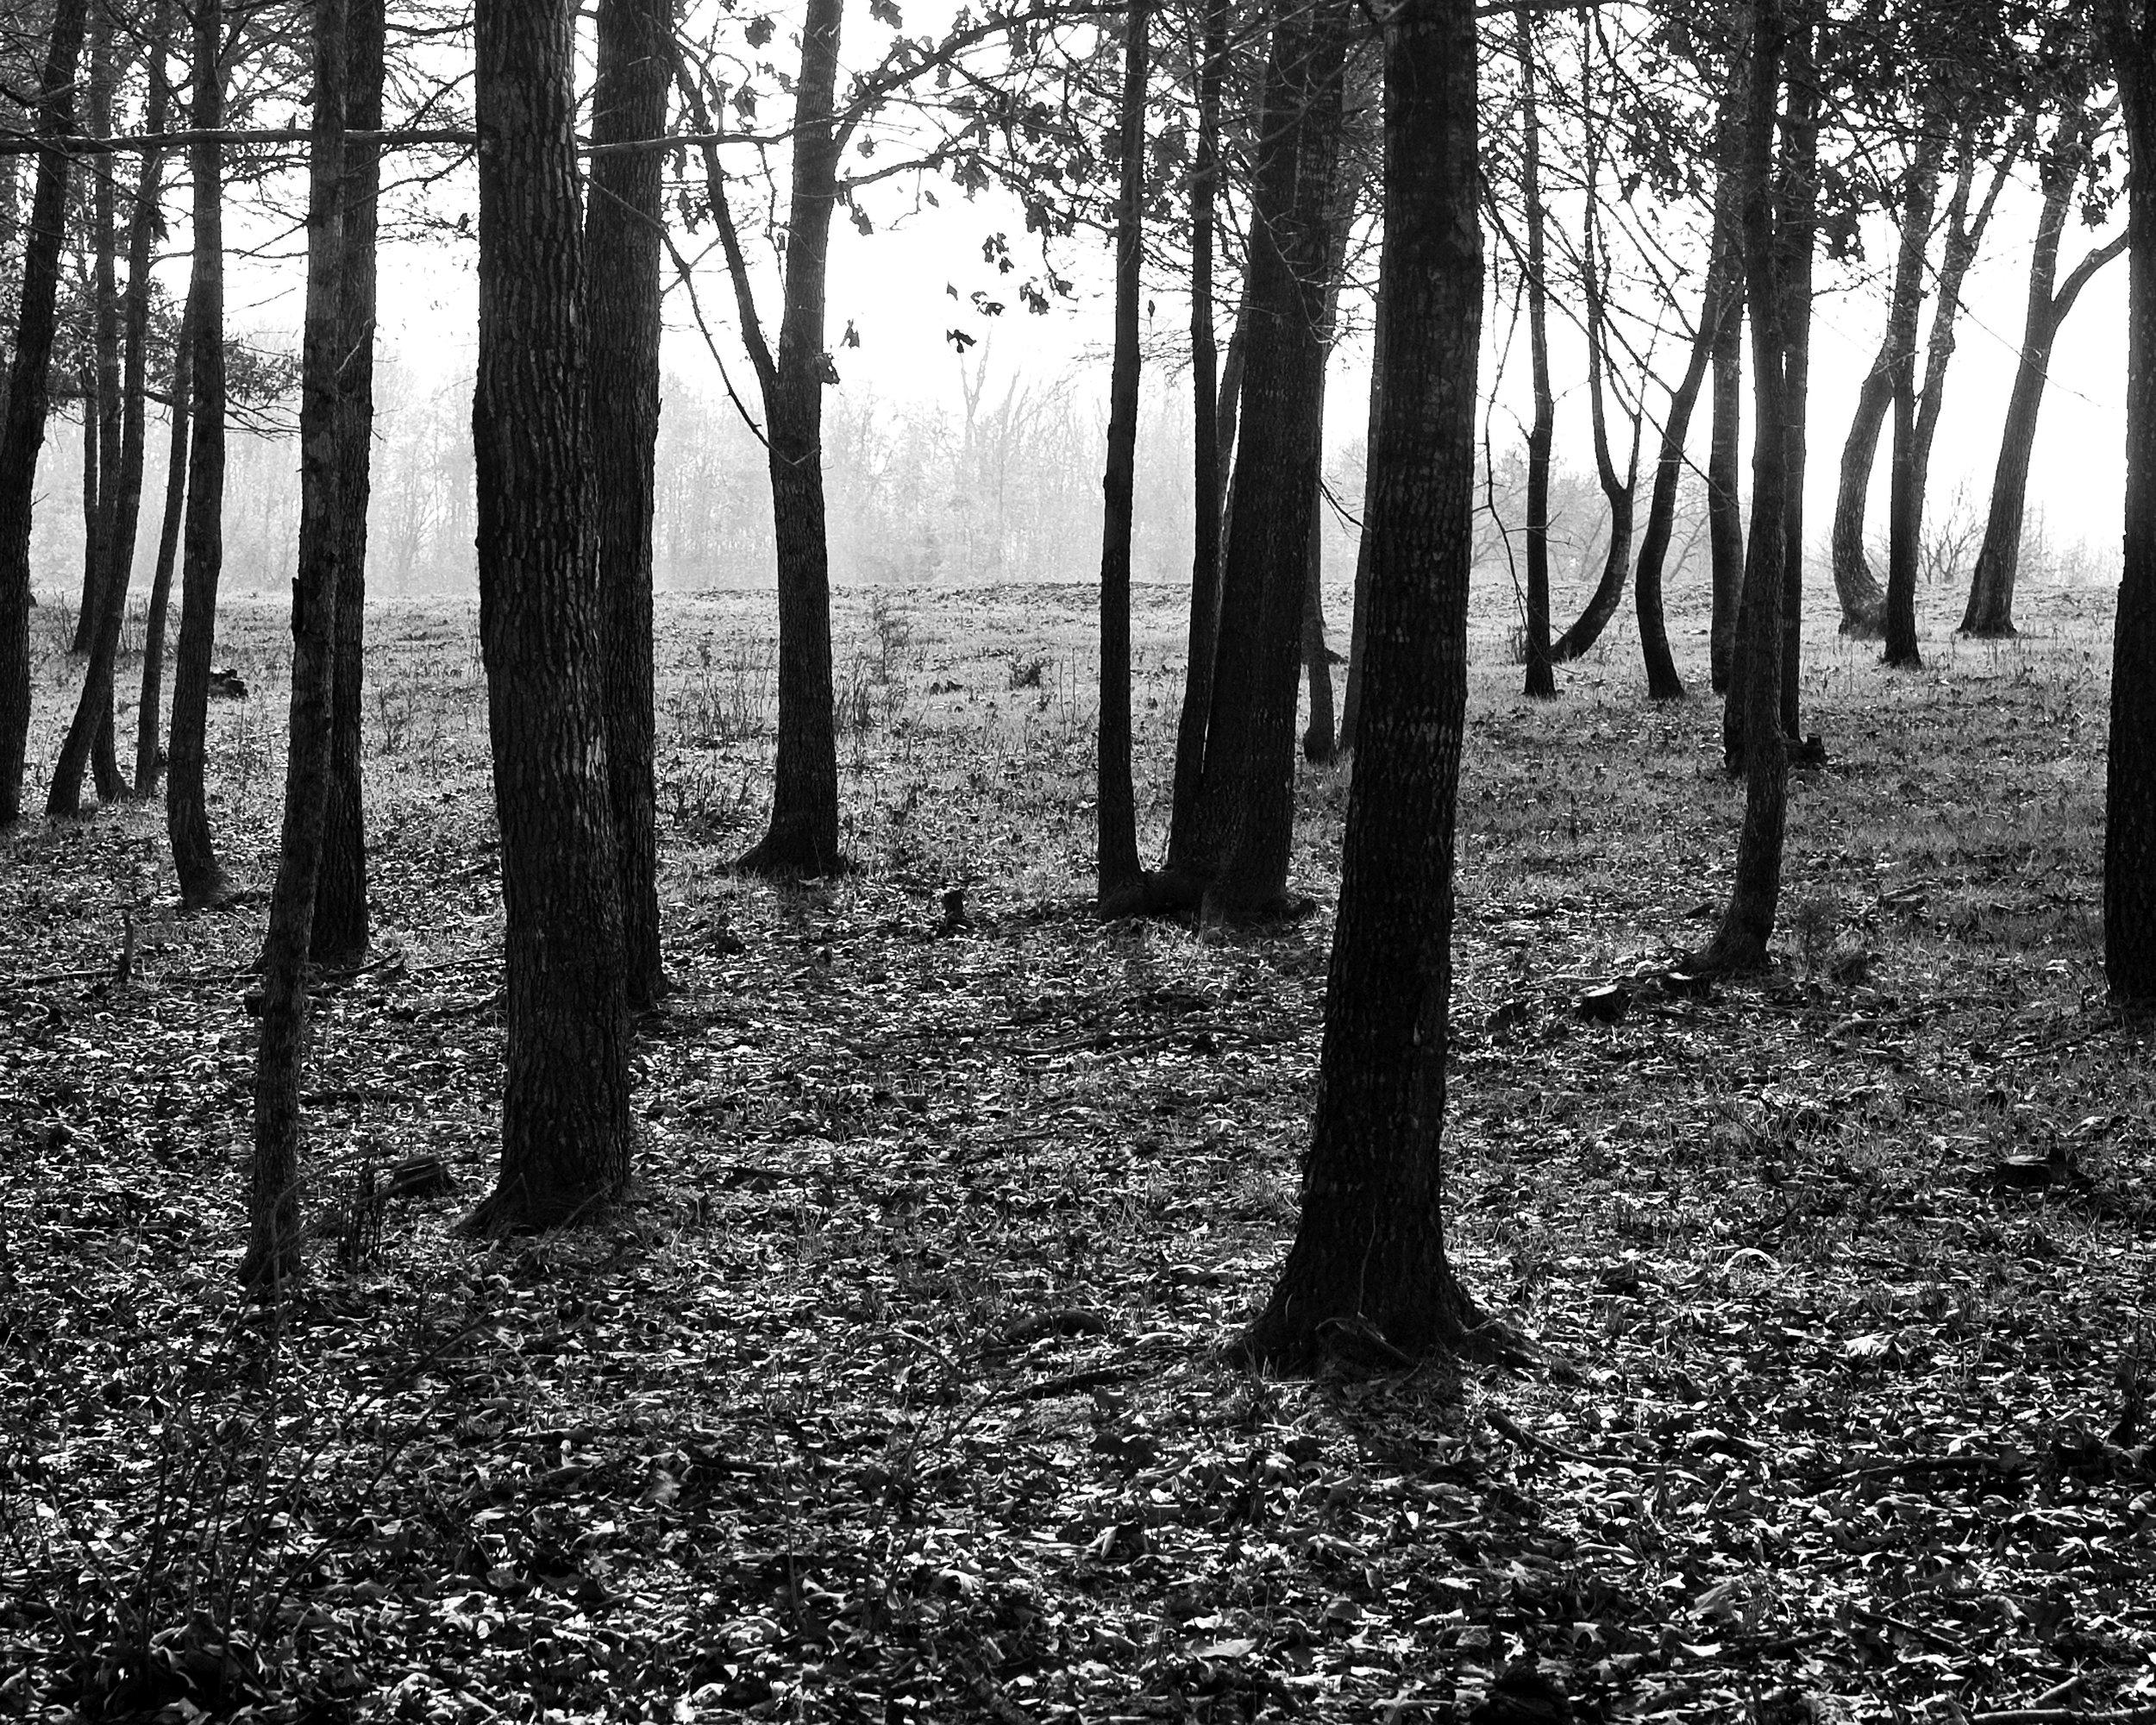 trees8x10.jpg